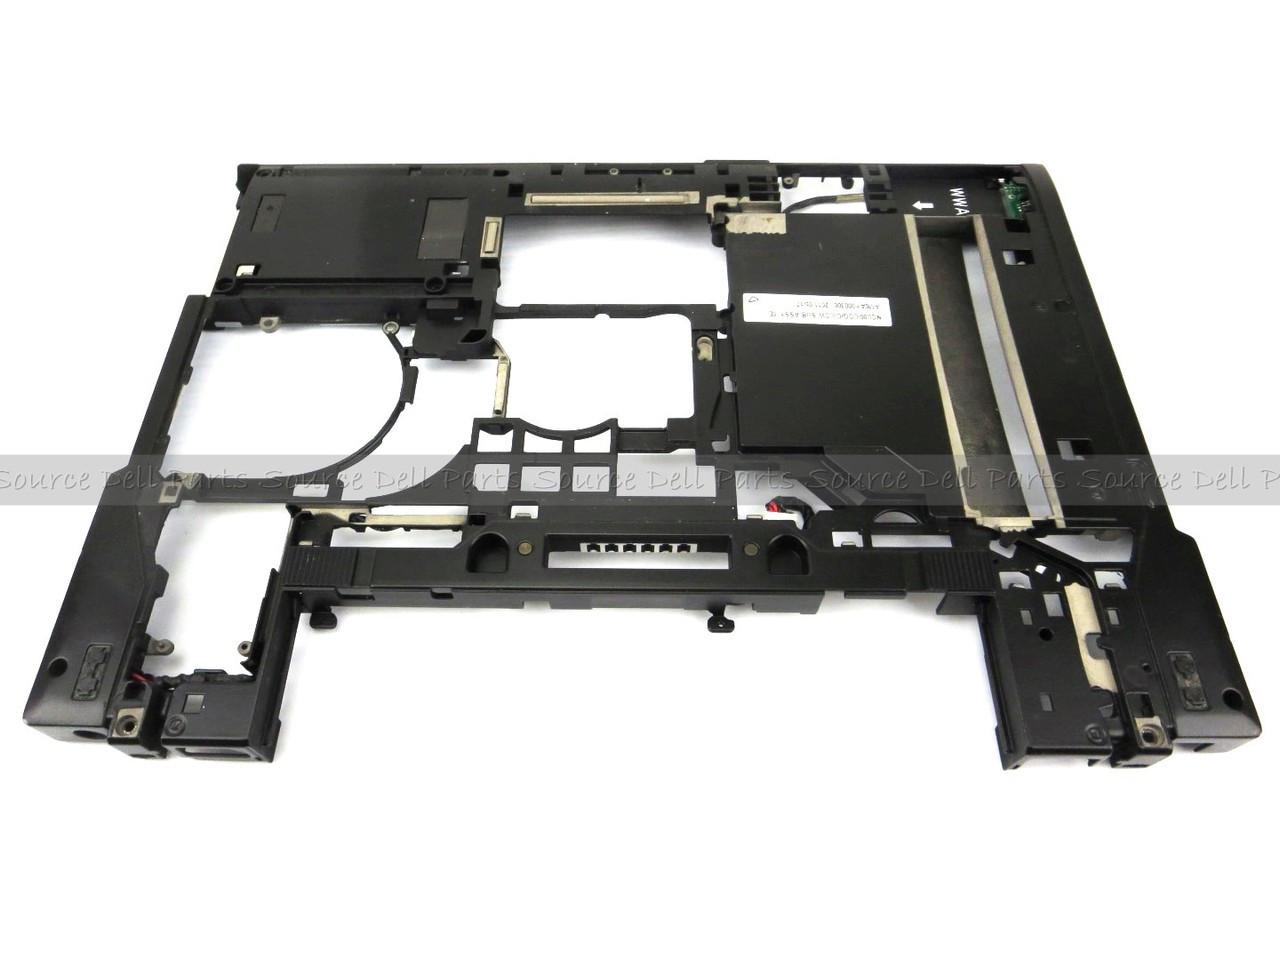 Dell Latitude E6410 Laptop Bottom Base Cover Assembly - N11DD